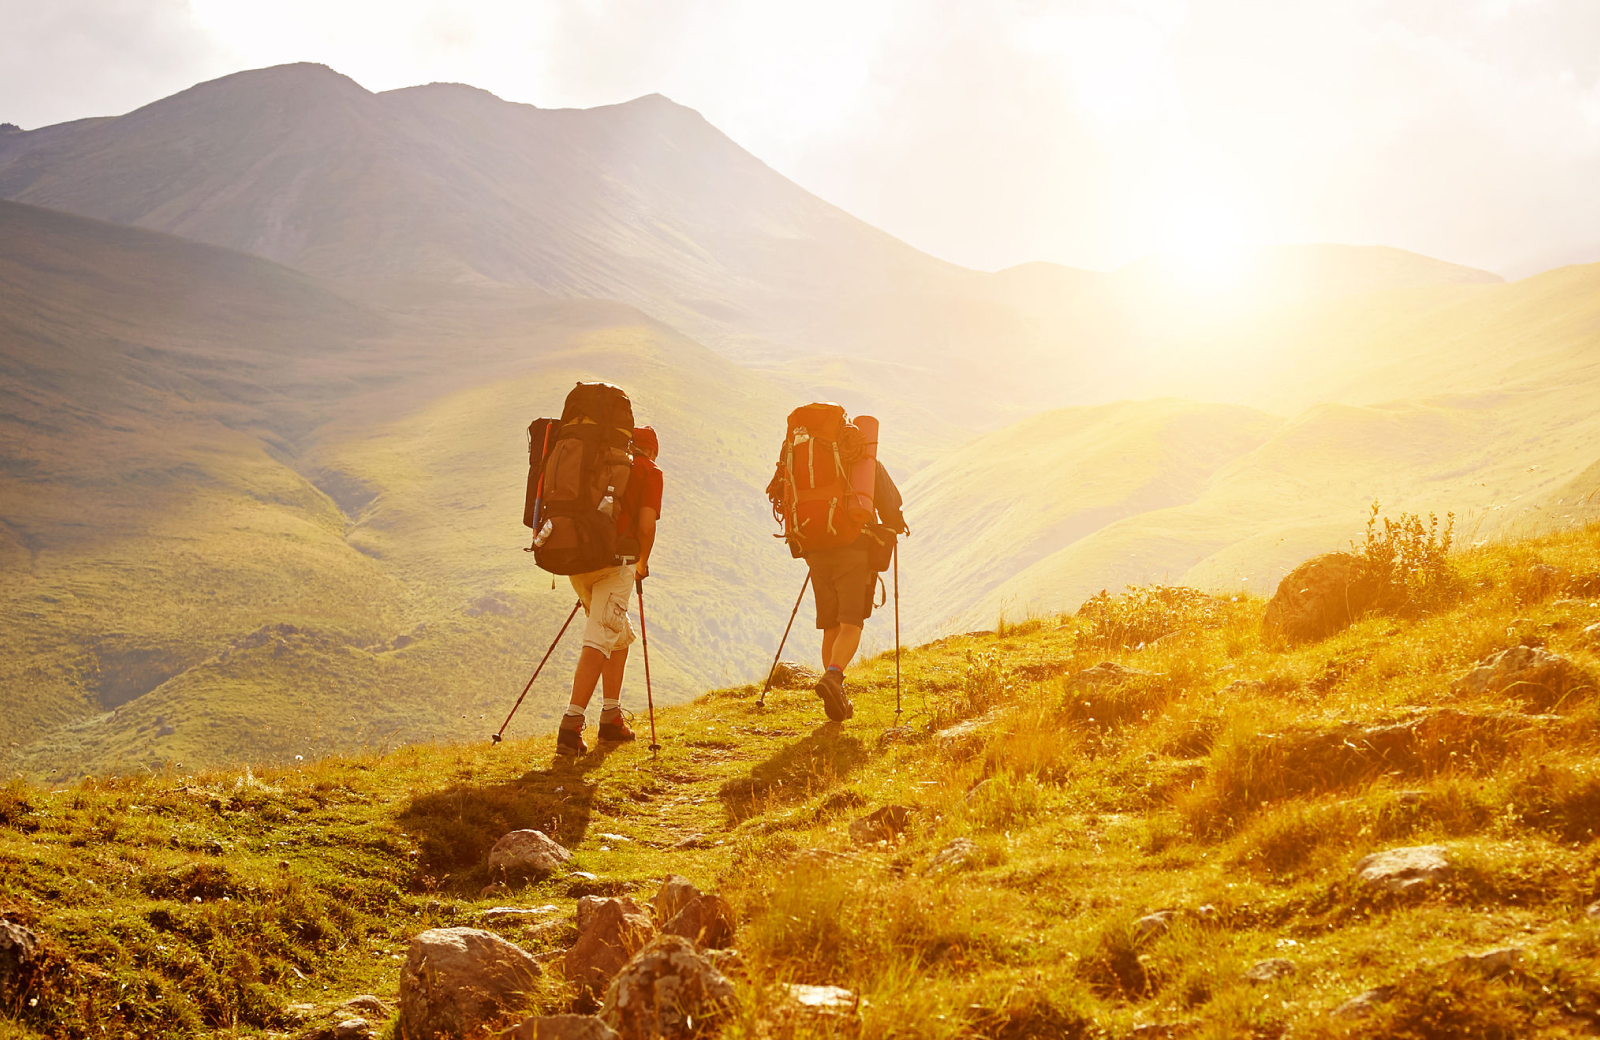 Glendale Hiking Trail - Altana Apts